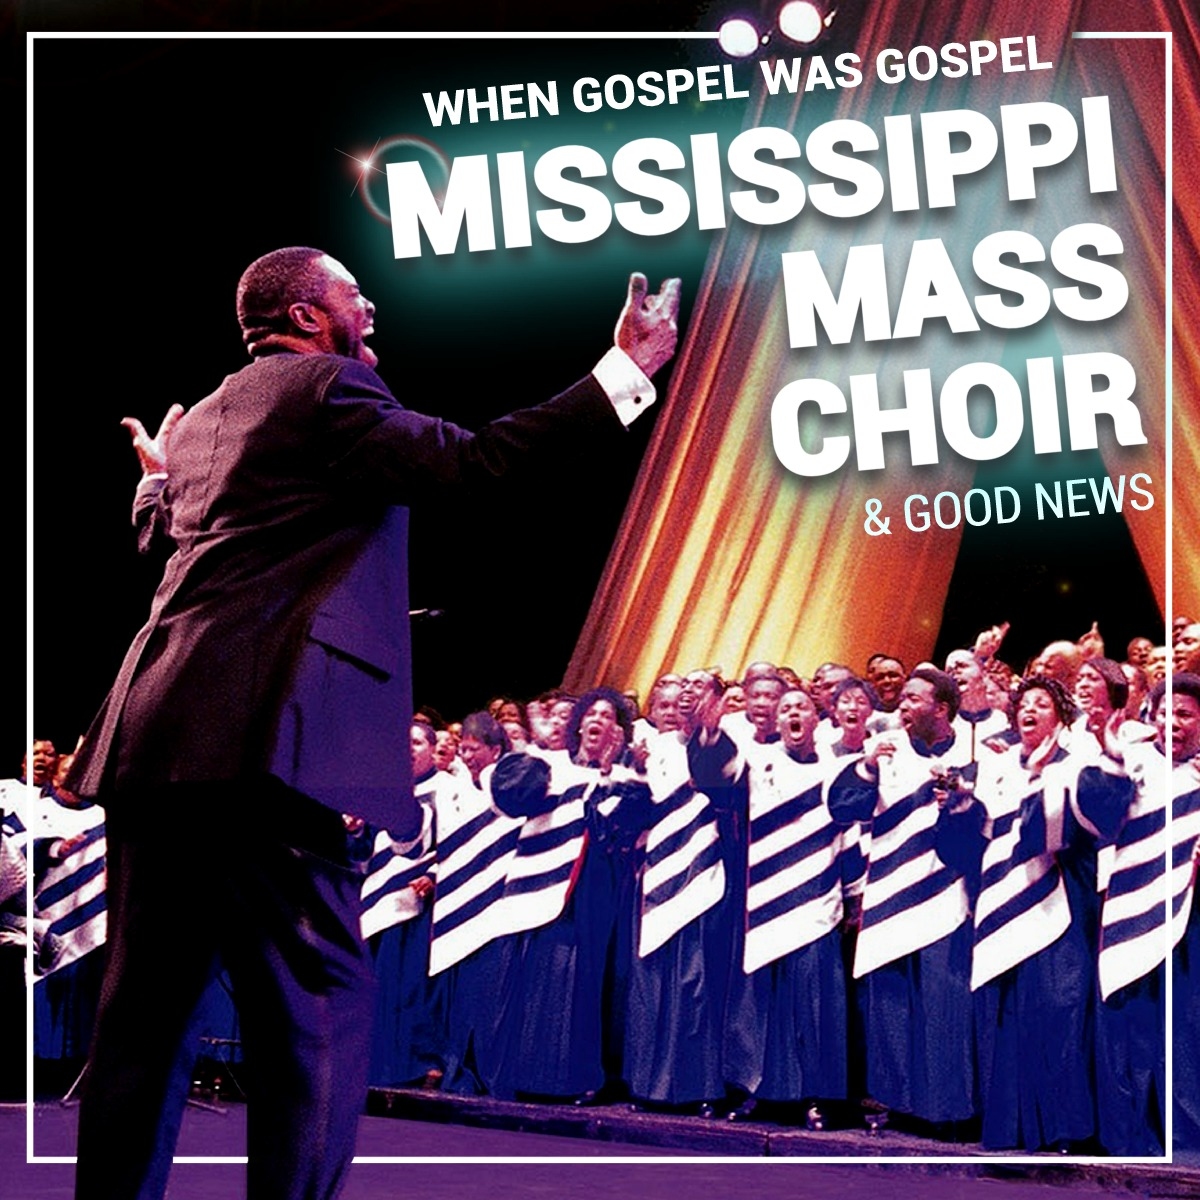 Pandora Producciones - Mississippi Mass Choir & Good News - When Gospel was Gospel - Valladolid - Diciembre - 2019